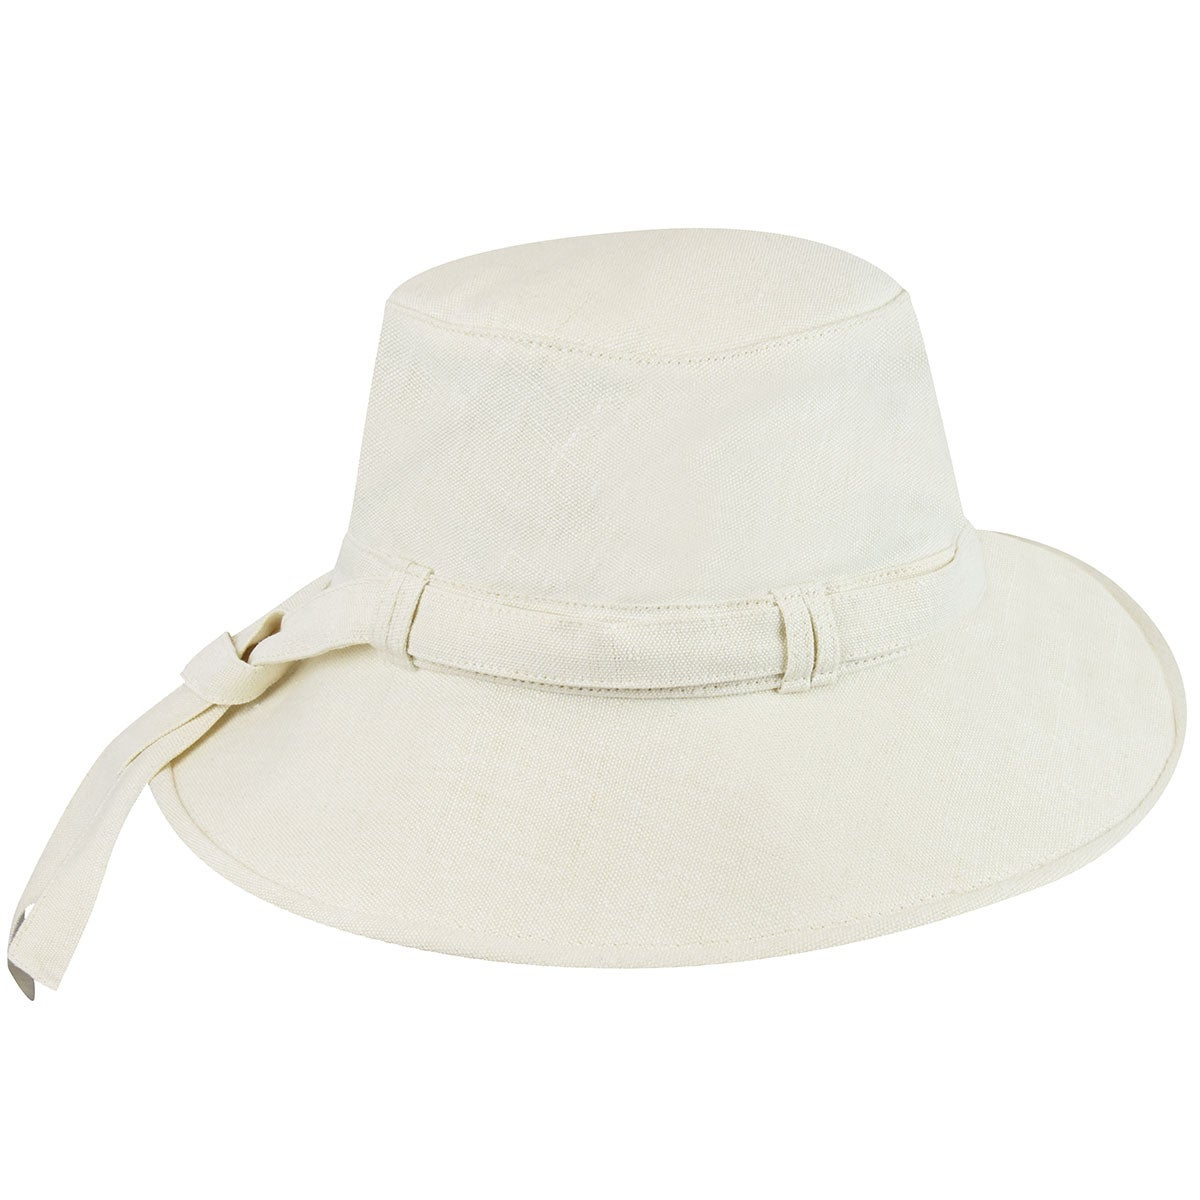 Tilley Melanie Hemp Sun Hat in Natural